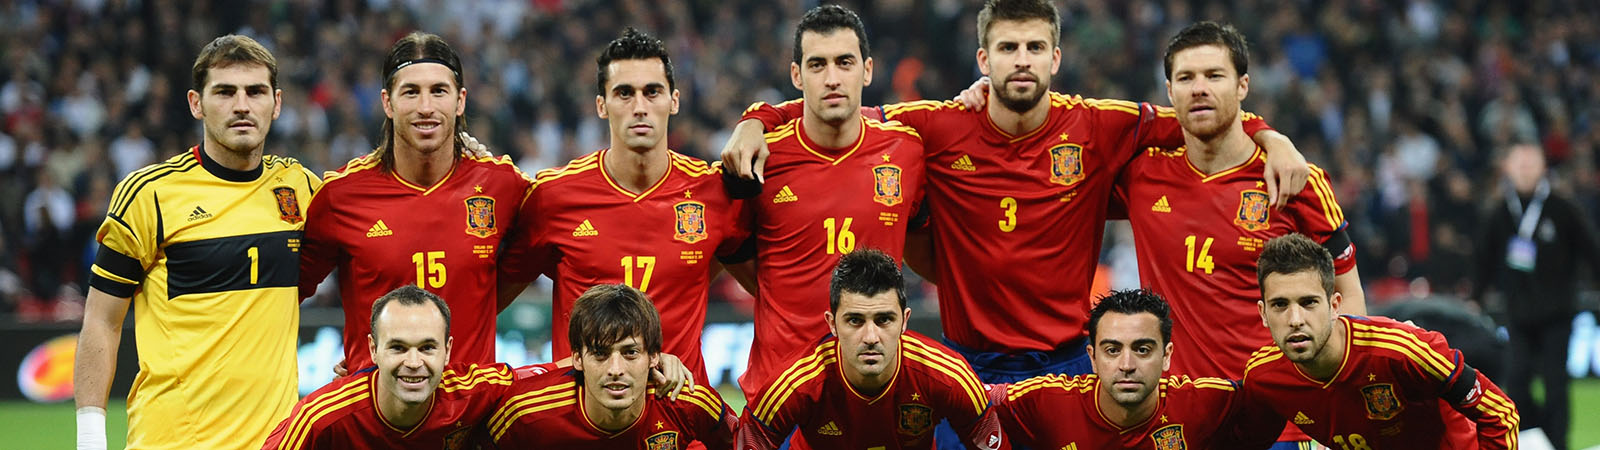 Seleccion Española fútbol